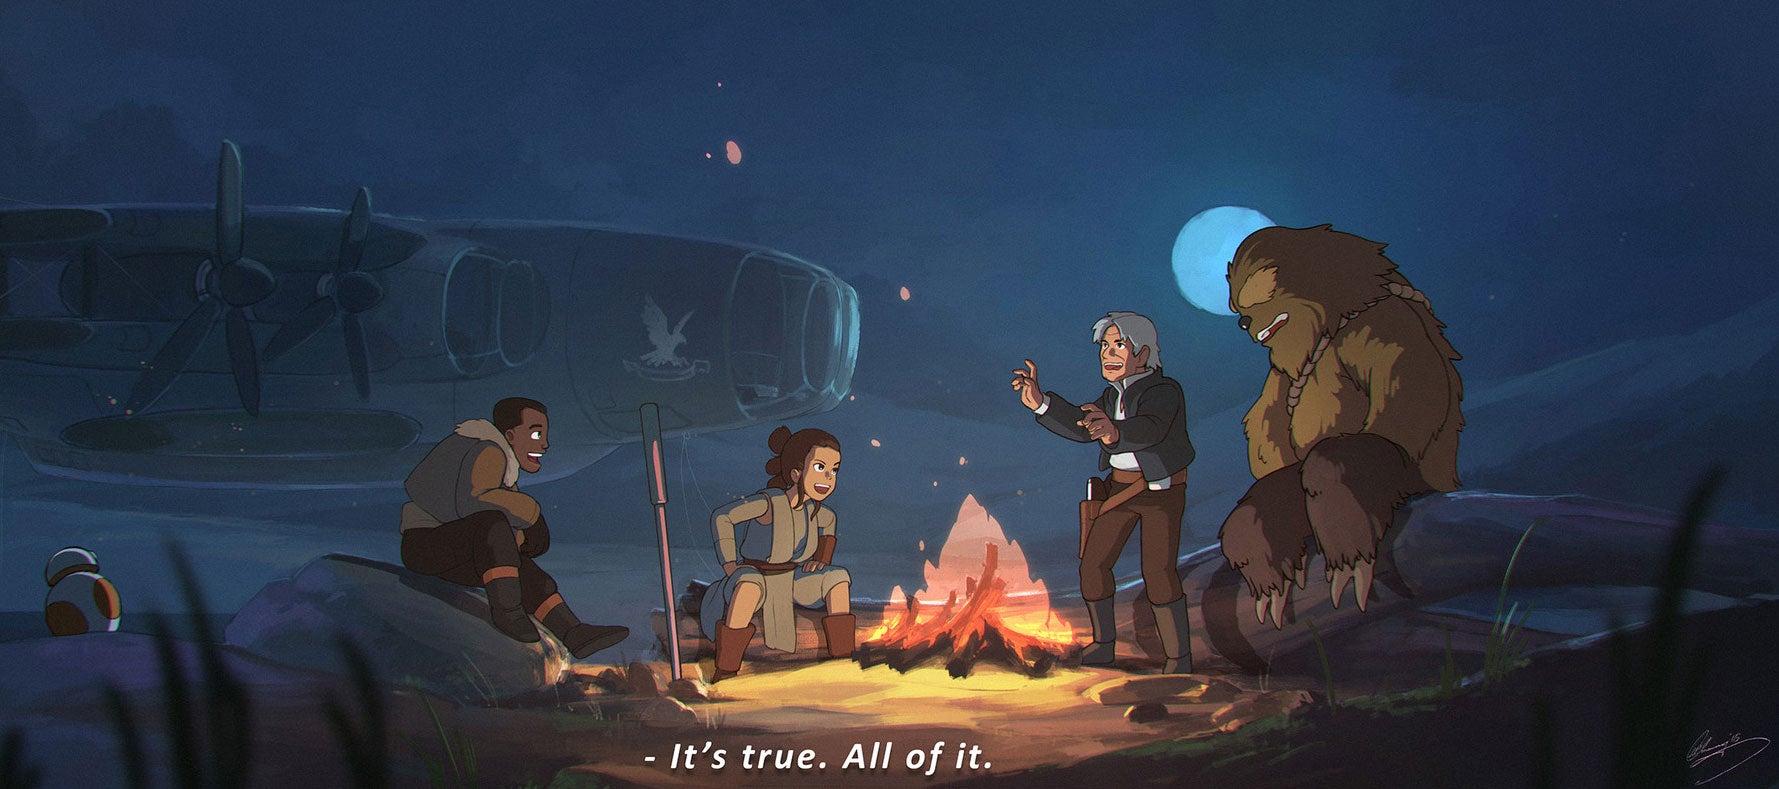 Star Wars vs Studio Ghibli